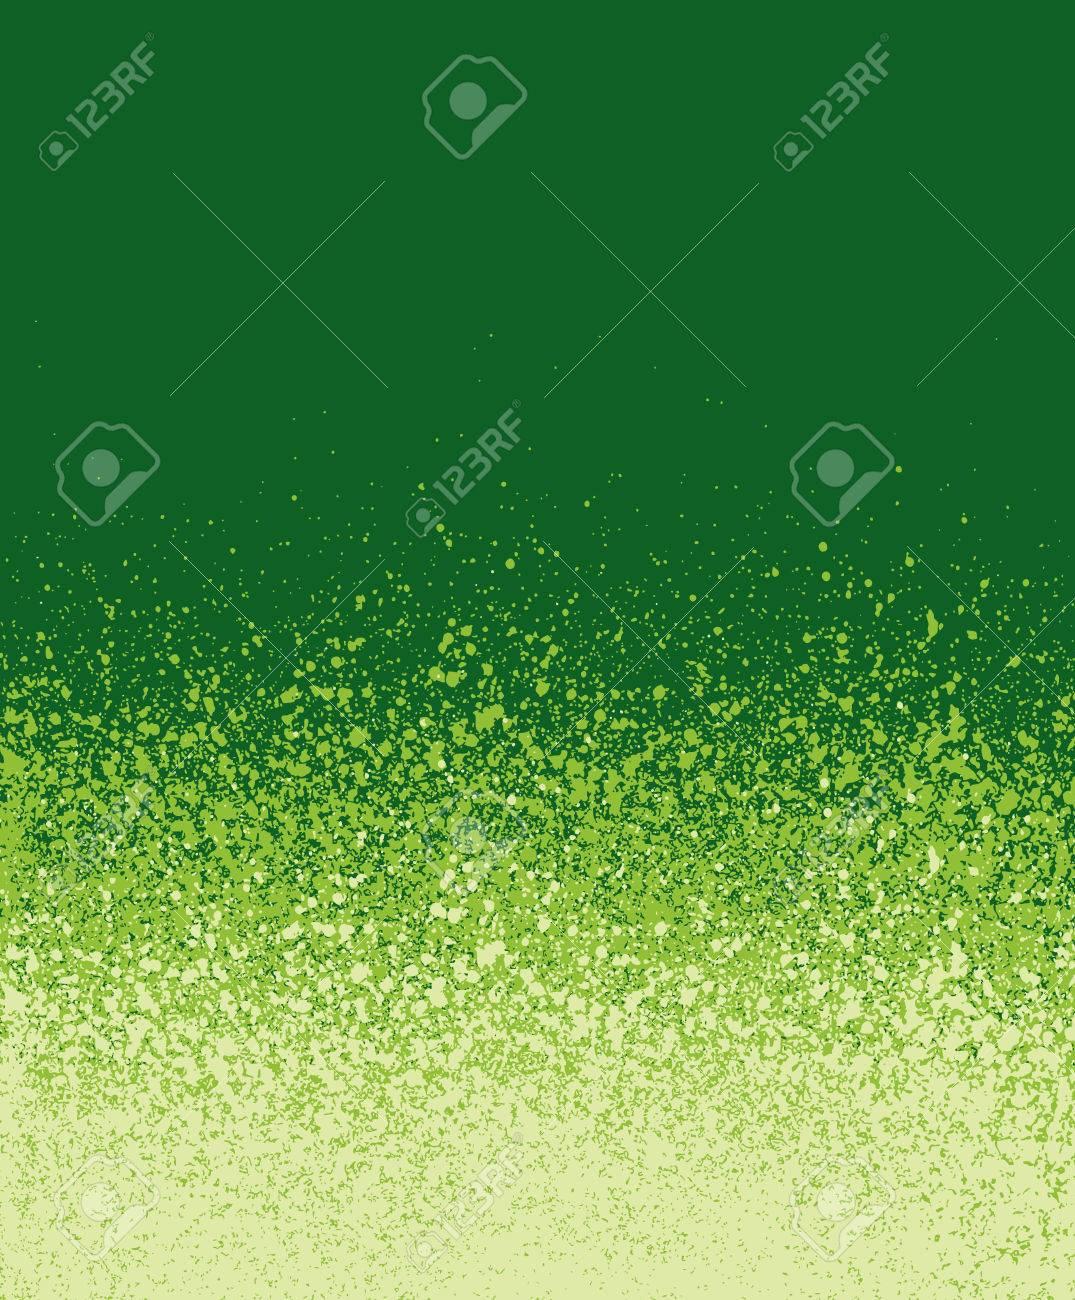 Vettoriale Graffiti Spray Dipinto Sfondo Verde Sfumato Image 48952087